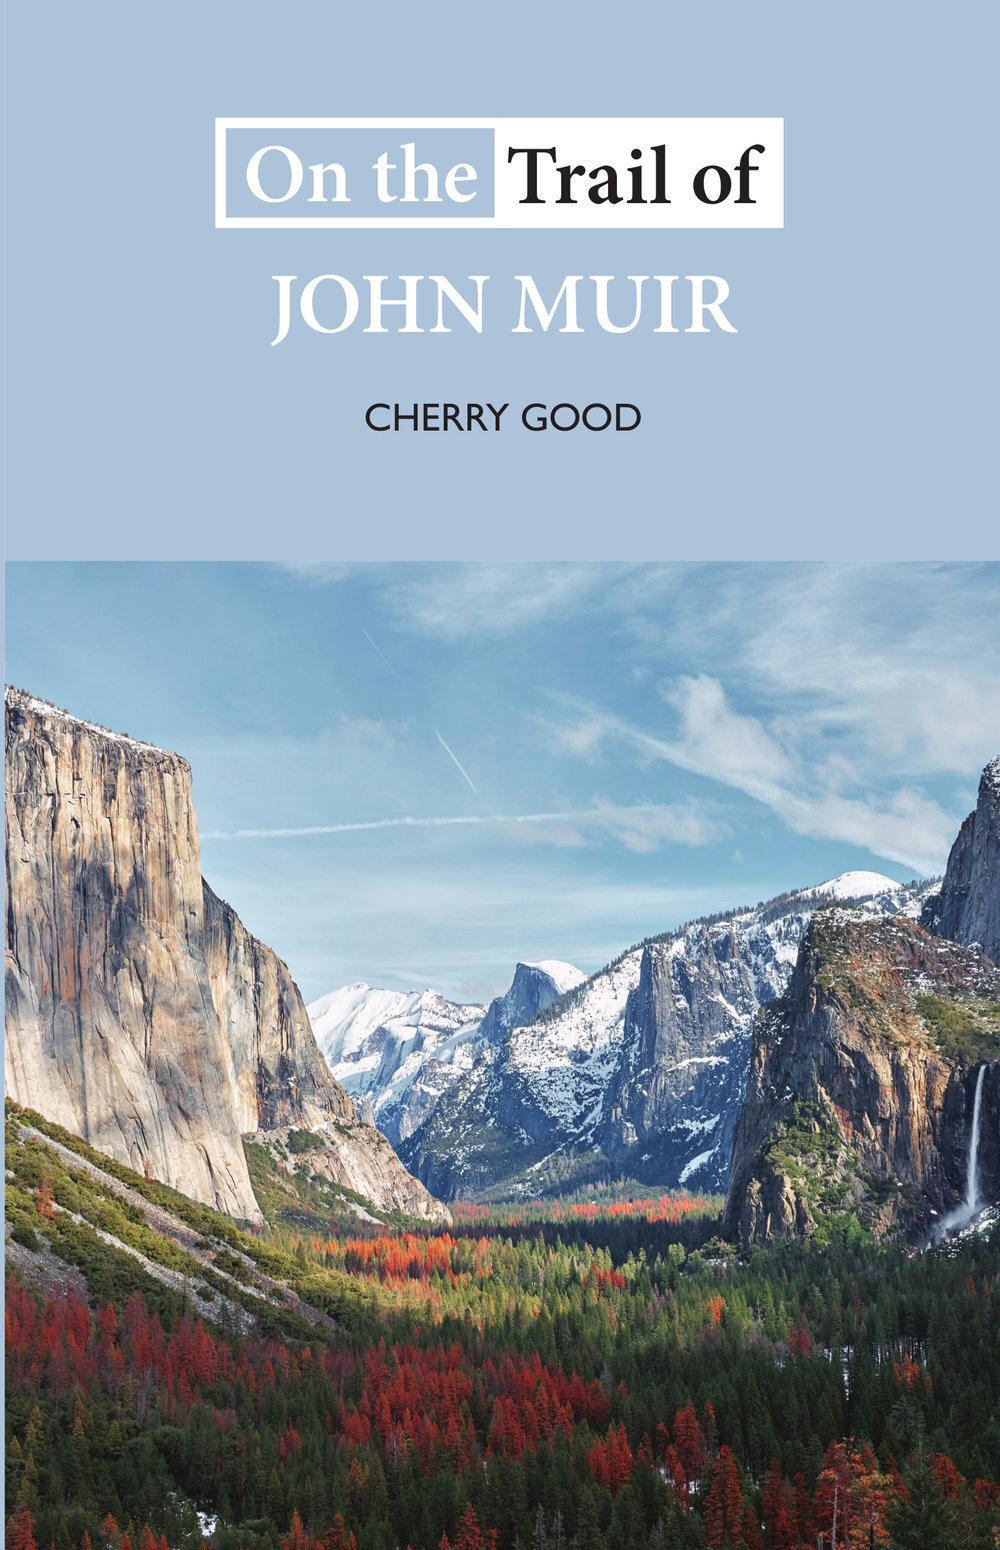 On+the+Trail+of+John+Muir+Cherry+Good+9781913025106+Luath+Press.jpg